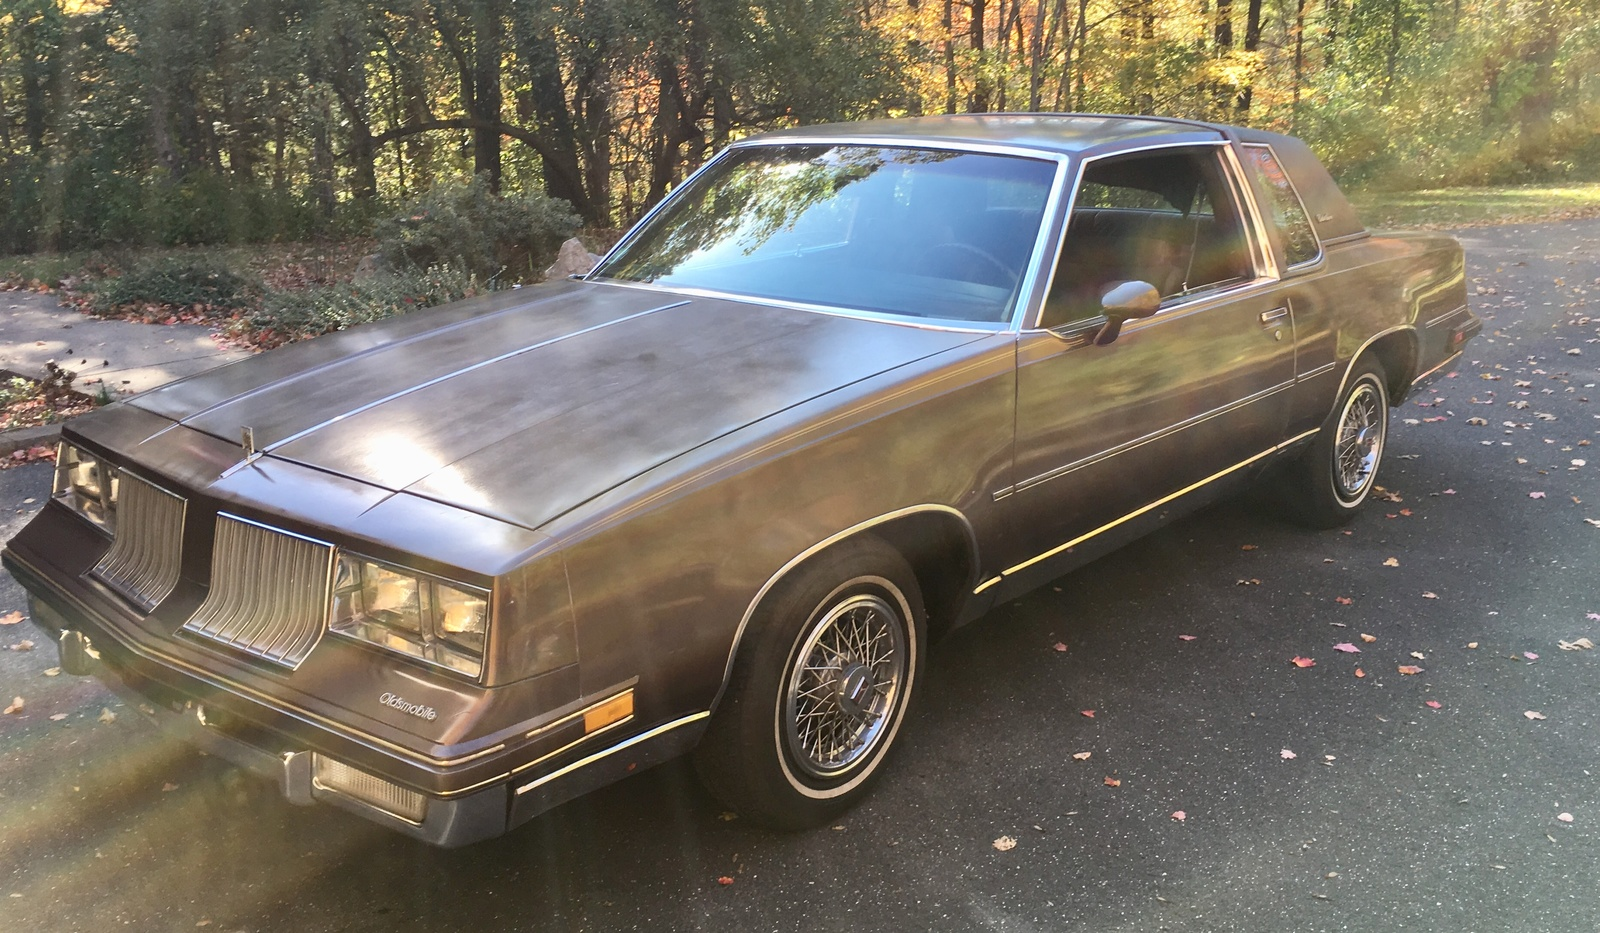 1984 Oldsmobile Cutlass Supreme - Overview - CarGurus